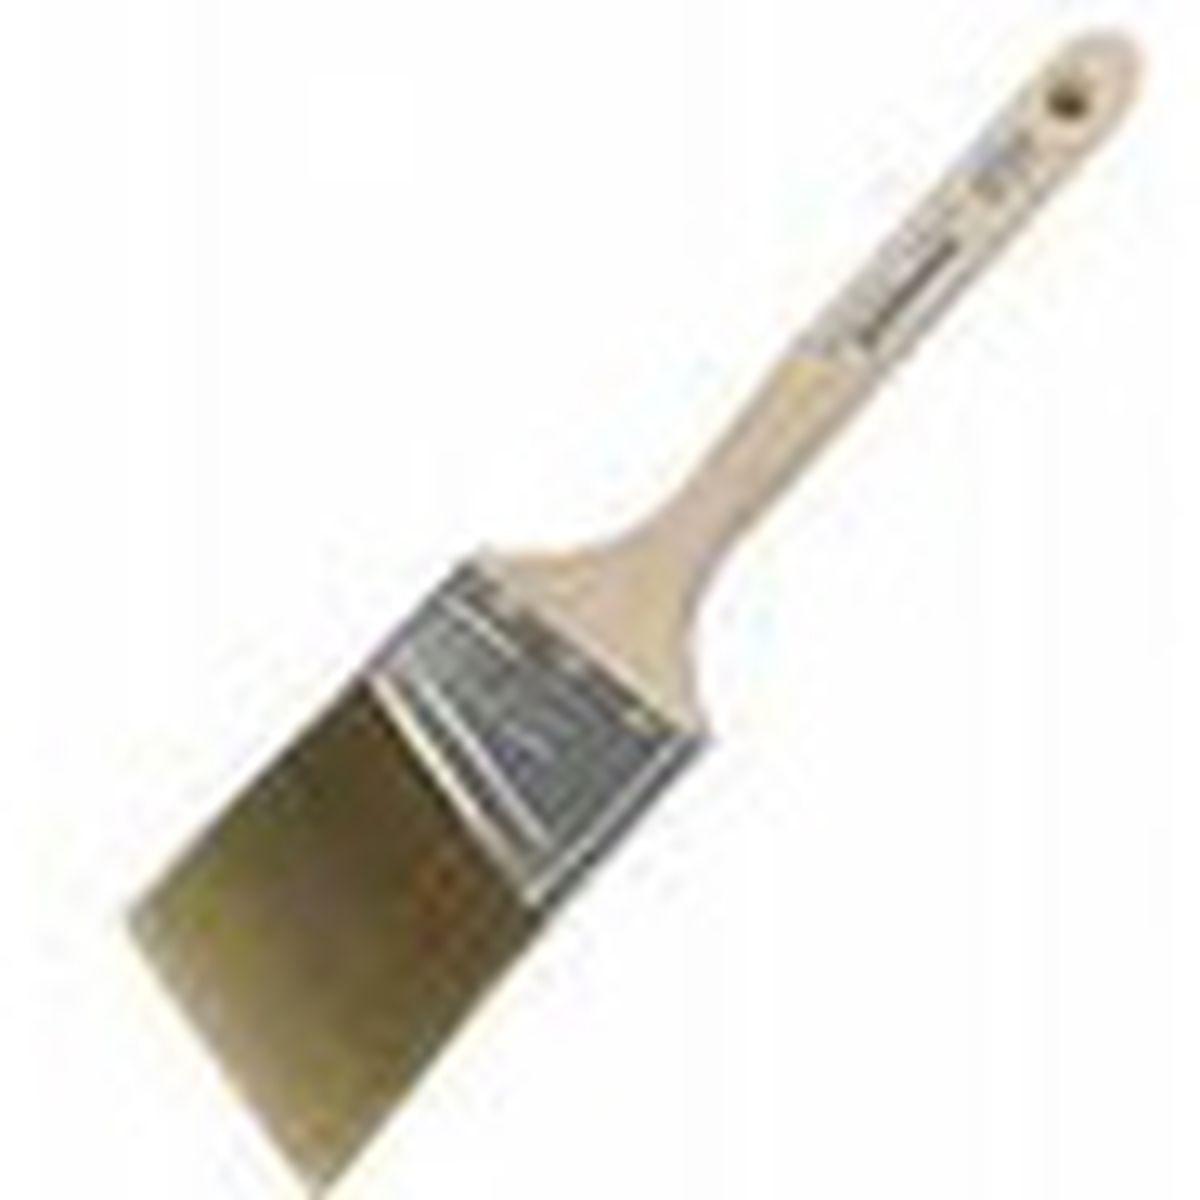 Sash Paint Brush - 2 1⁄2 inch